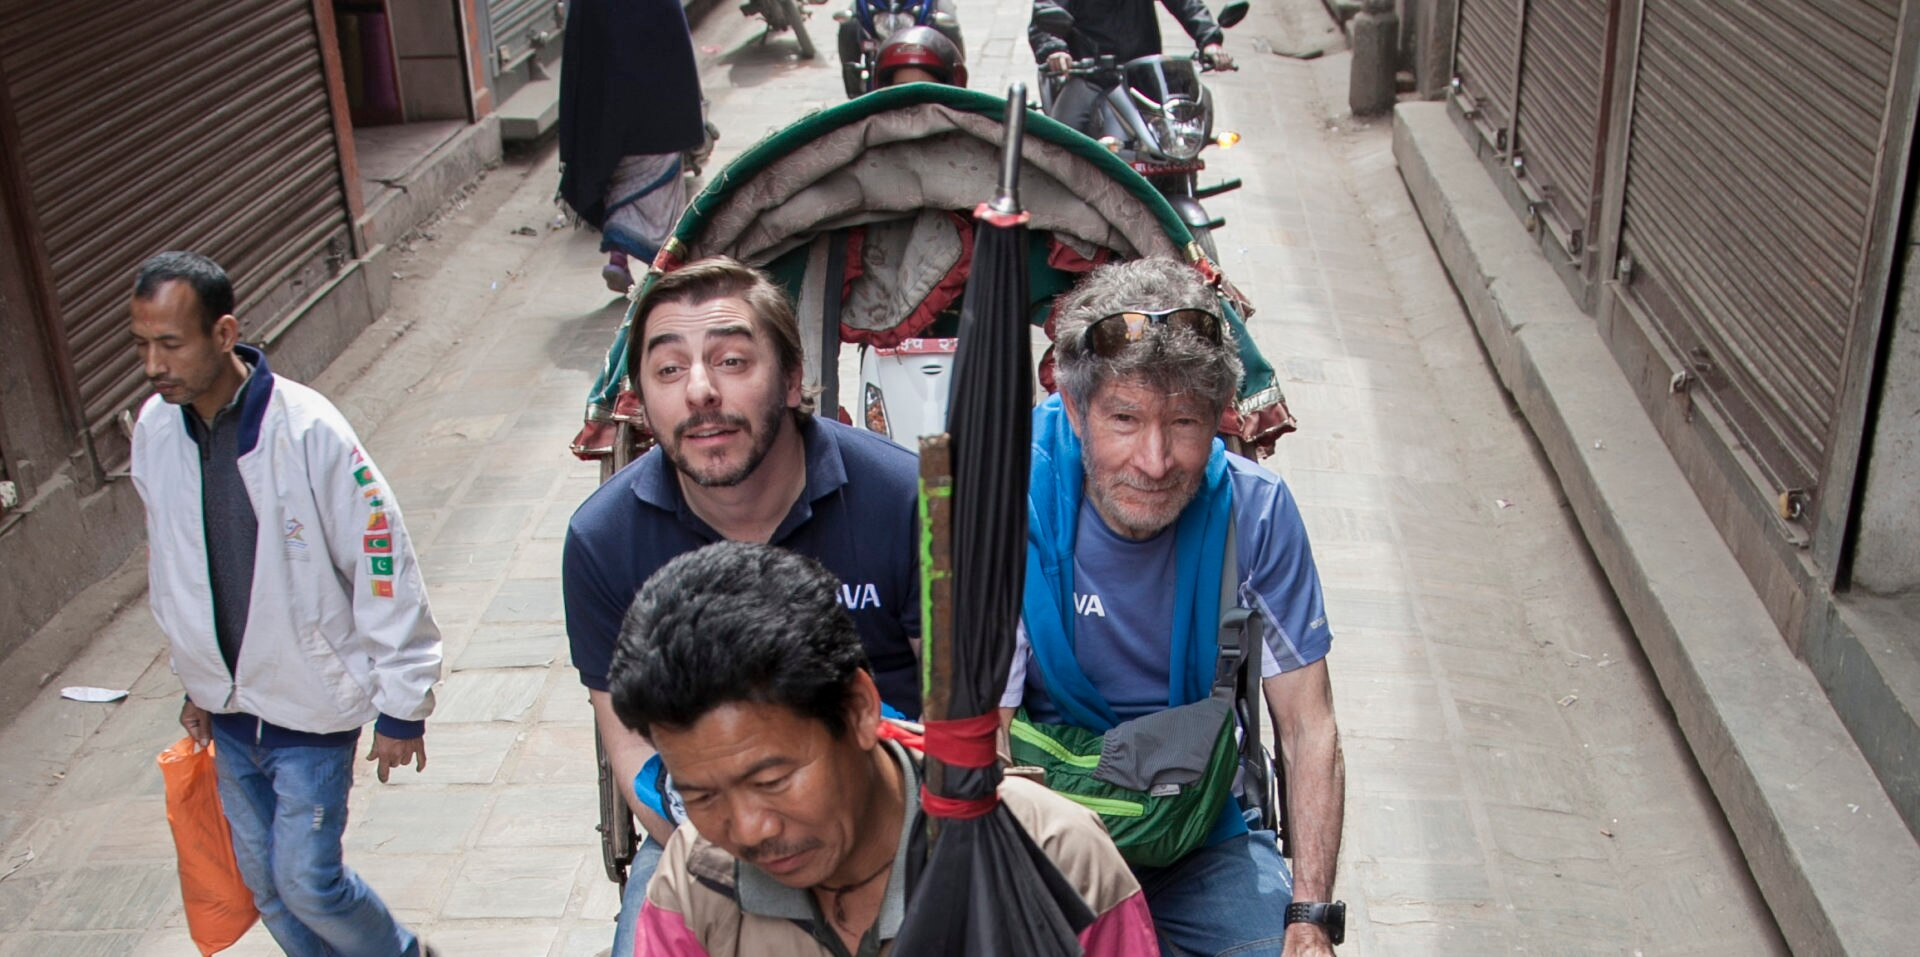 Carlos Soria y Jordi recorren las calles de Katmandu en un rickshaw